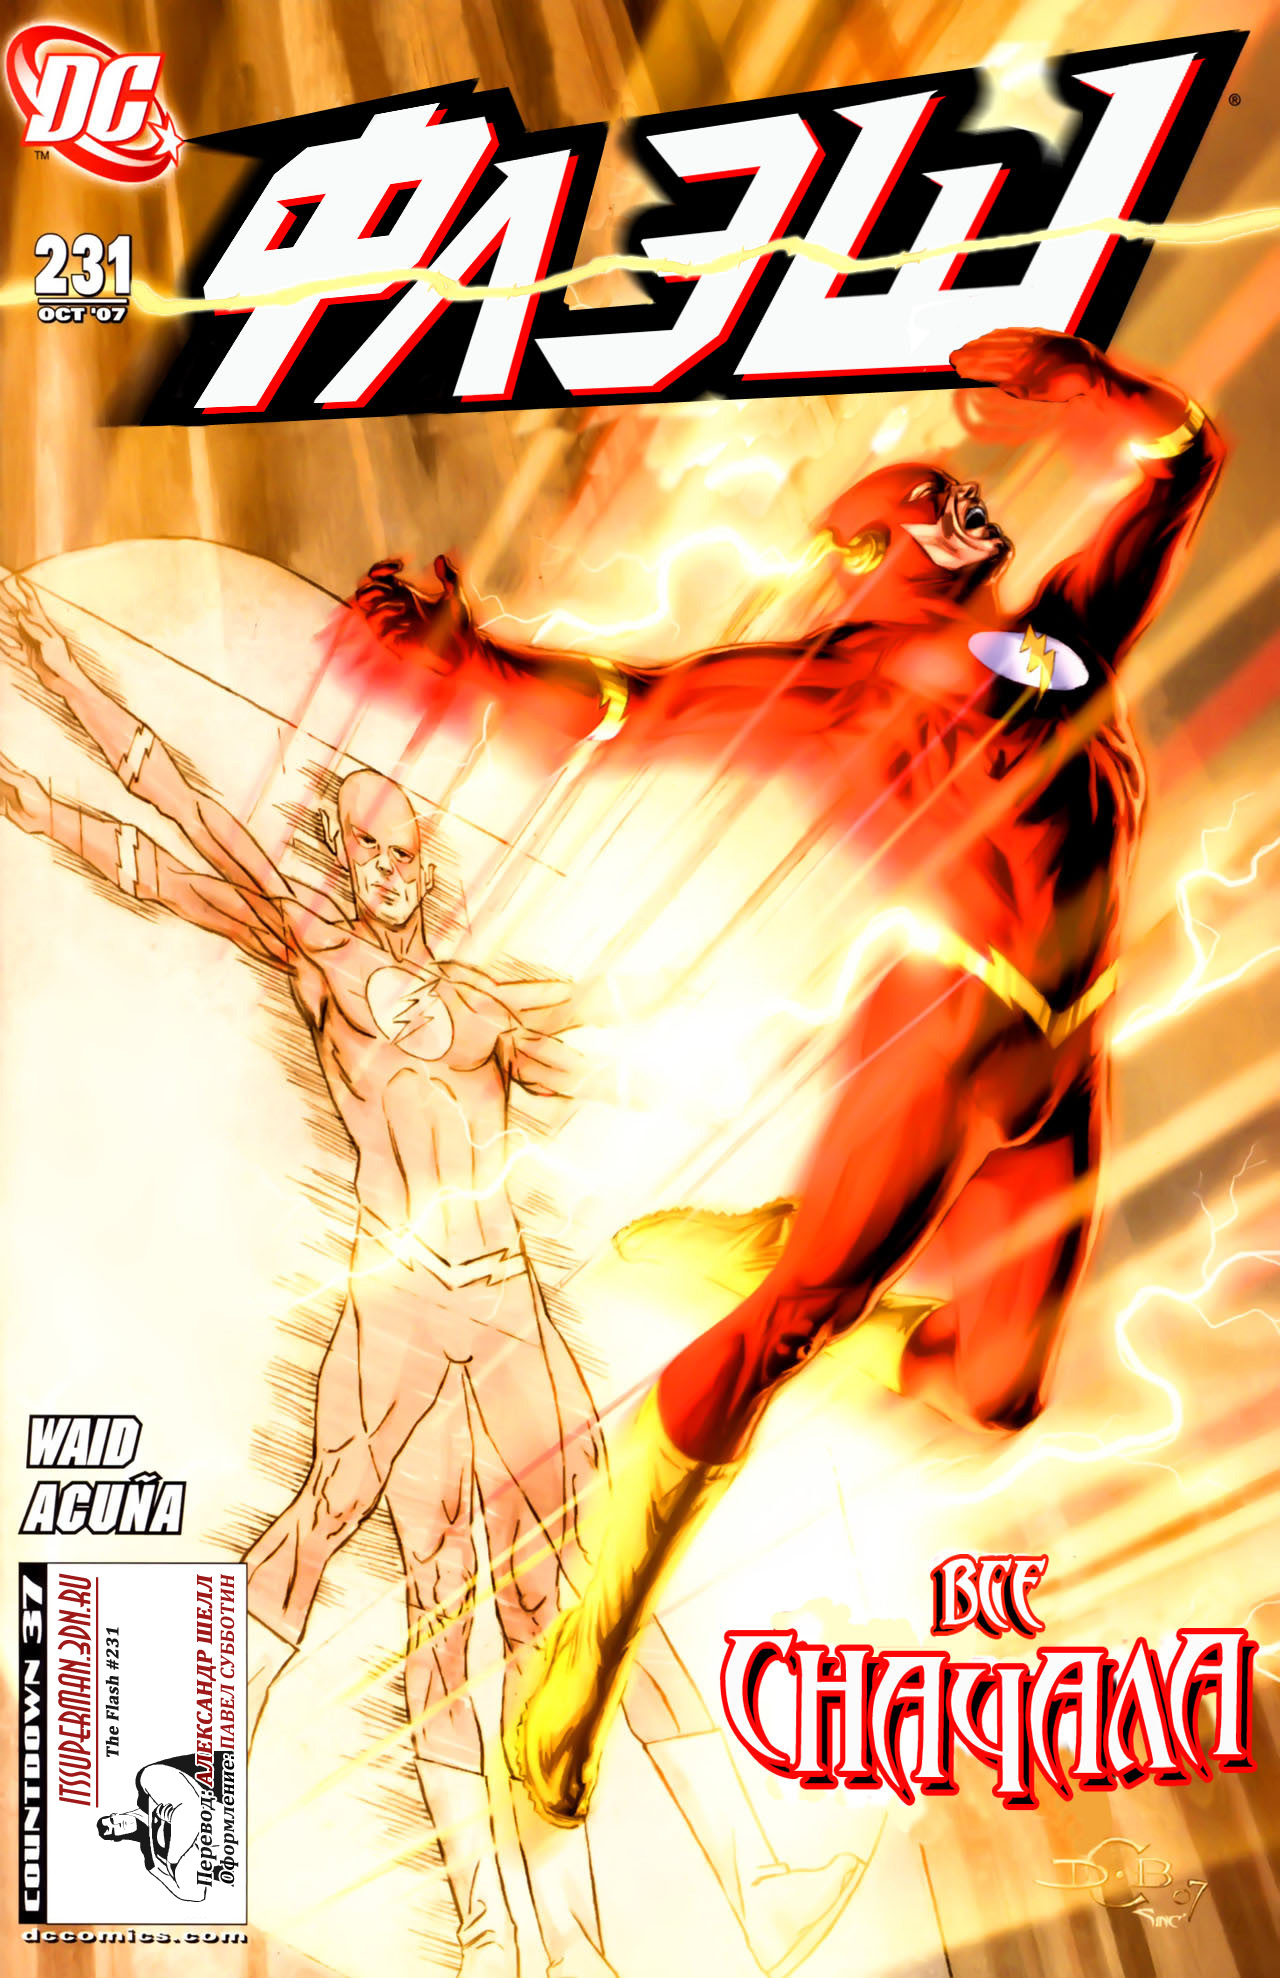 Комиксы Онлайн - Флеш том 2 - # 231 - Страница №1 - Flash vol 2 - # 231